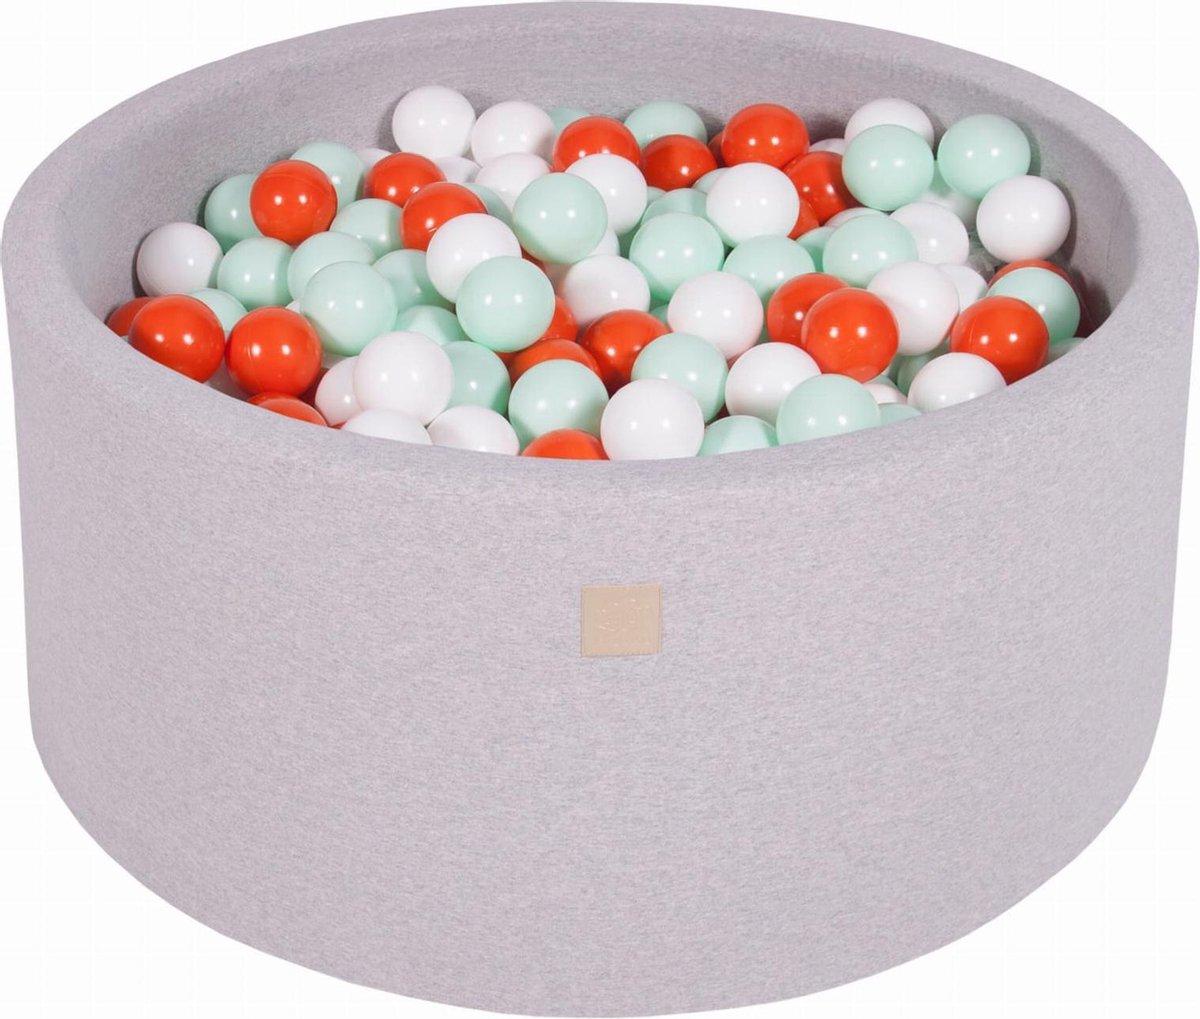 Ronde Ballenbak set incl 300 ballen 90x40cm - Licht Grijs: Oranje, Wit, Mint